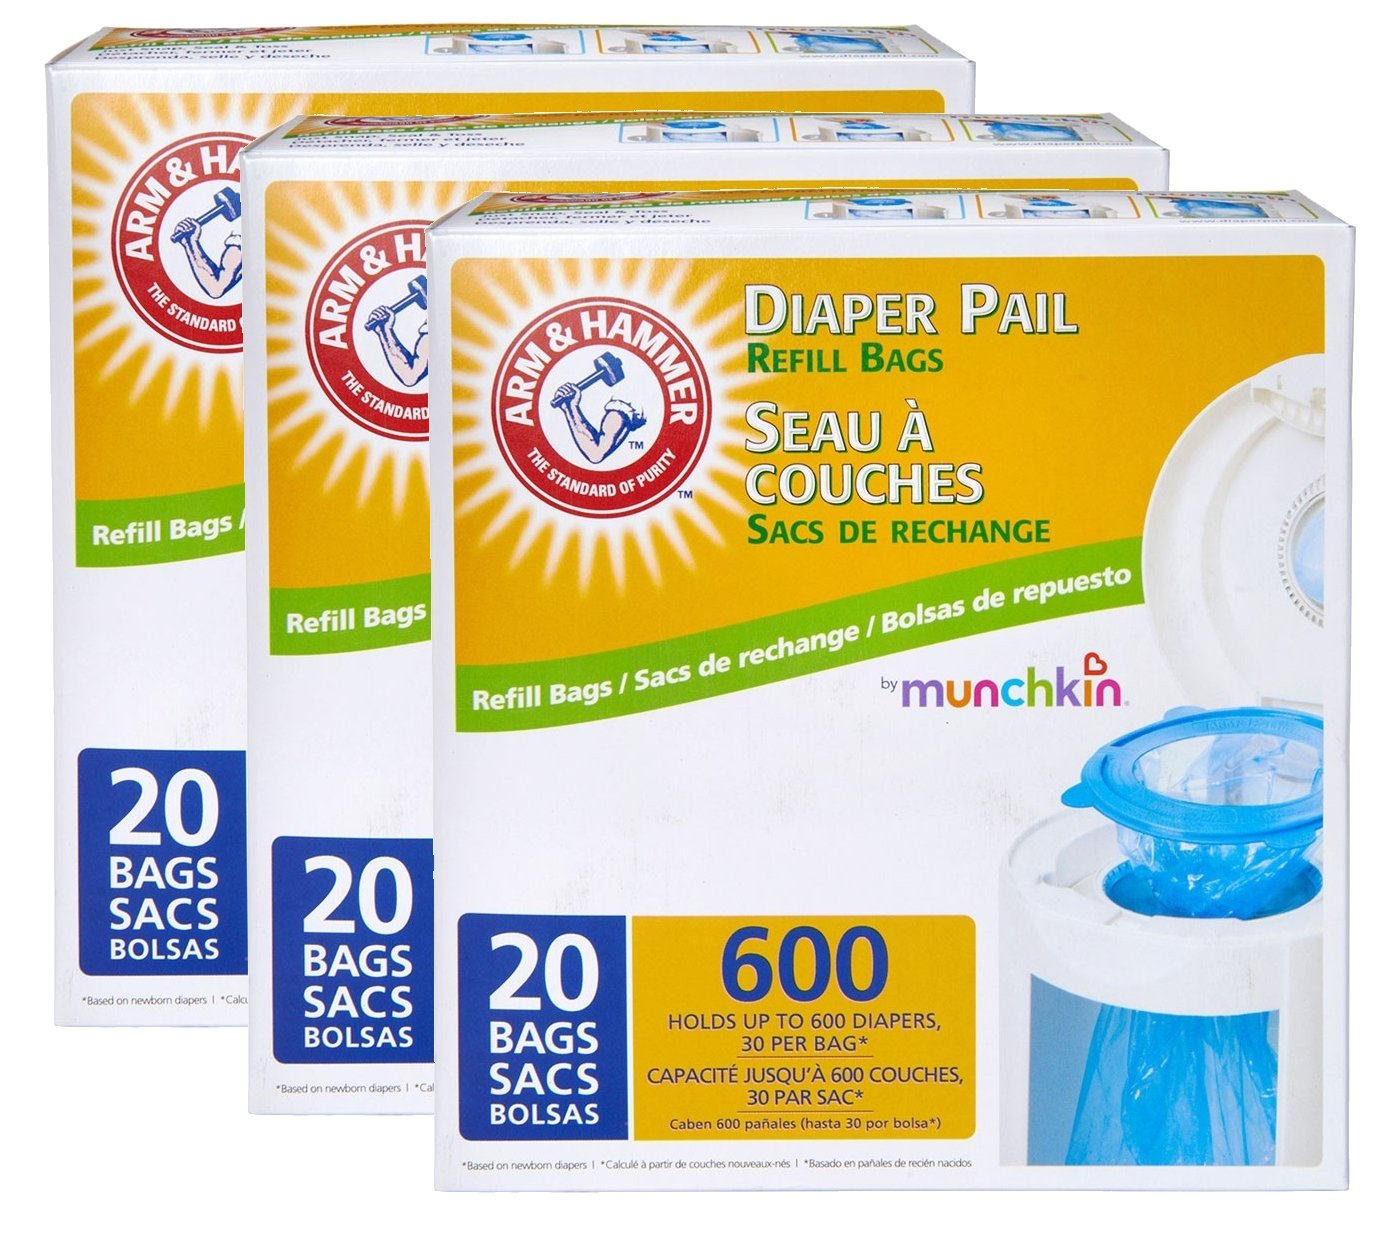 Munchkin Arm & Hammer Diaper Pail Refill Bags, 60 Count